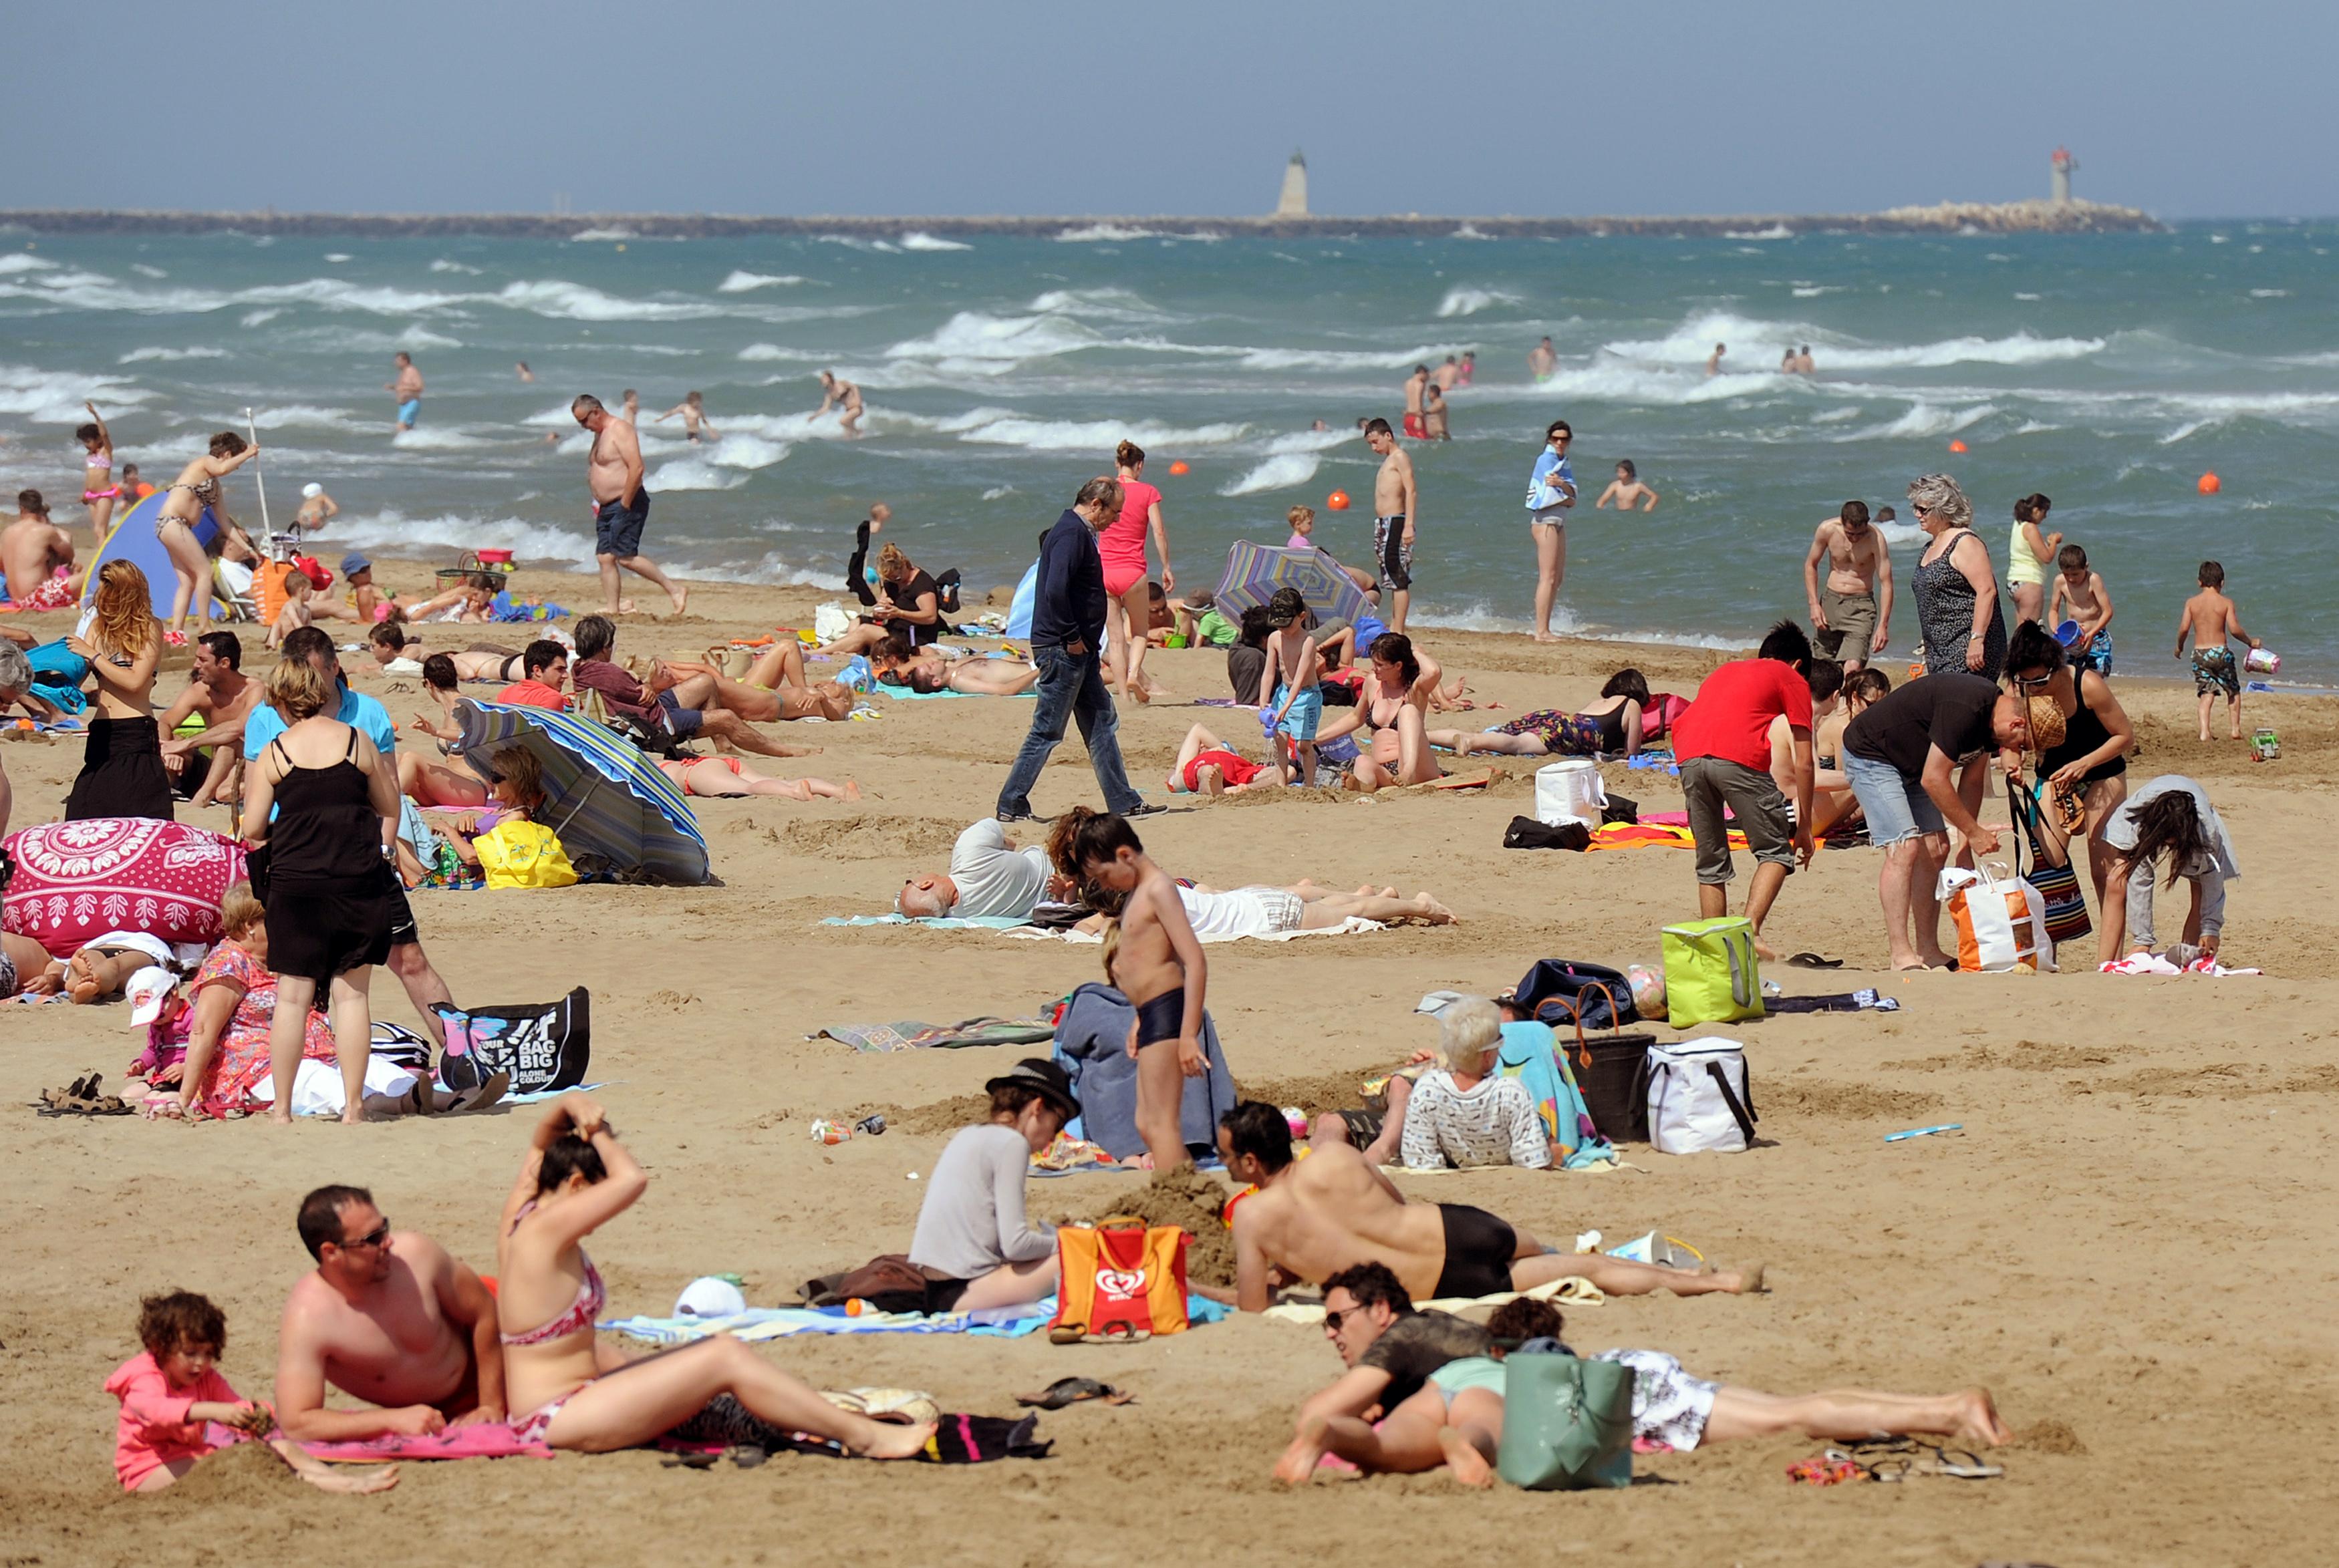 Фото с пляжа россия